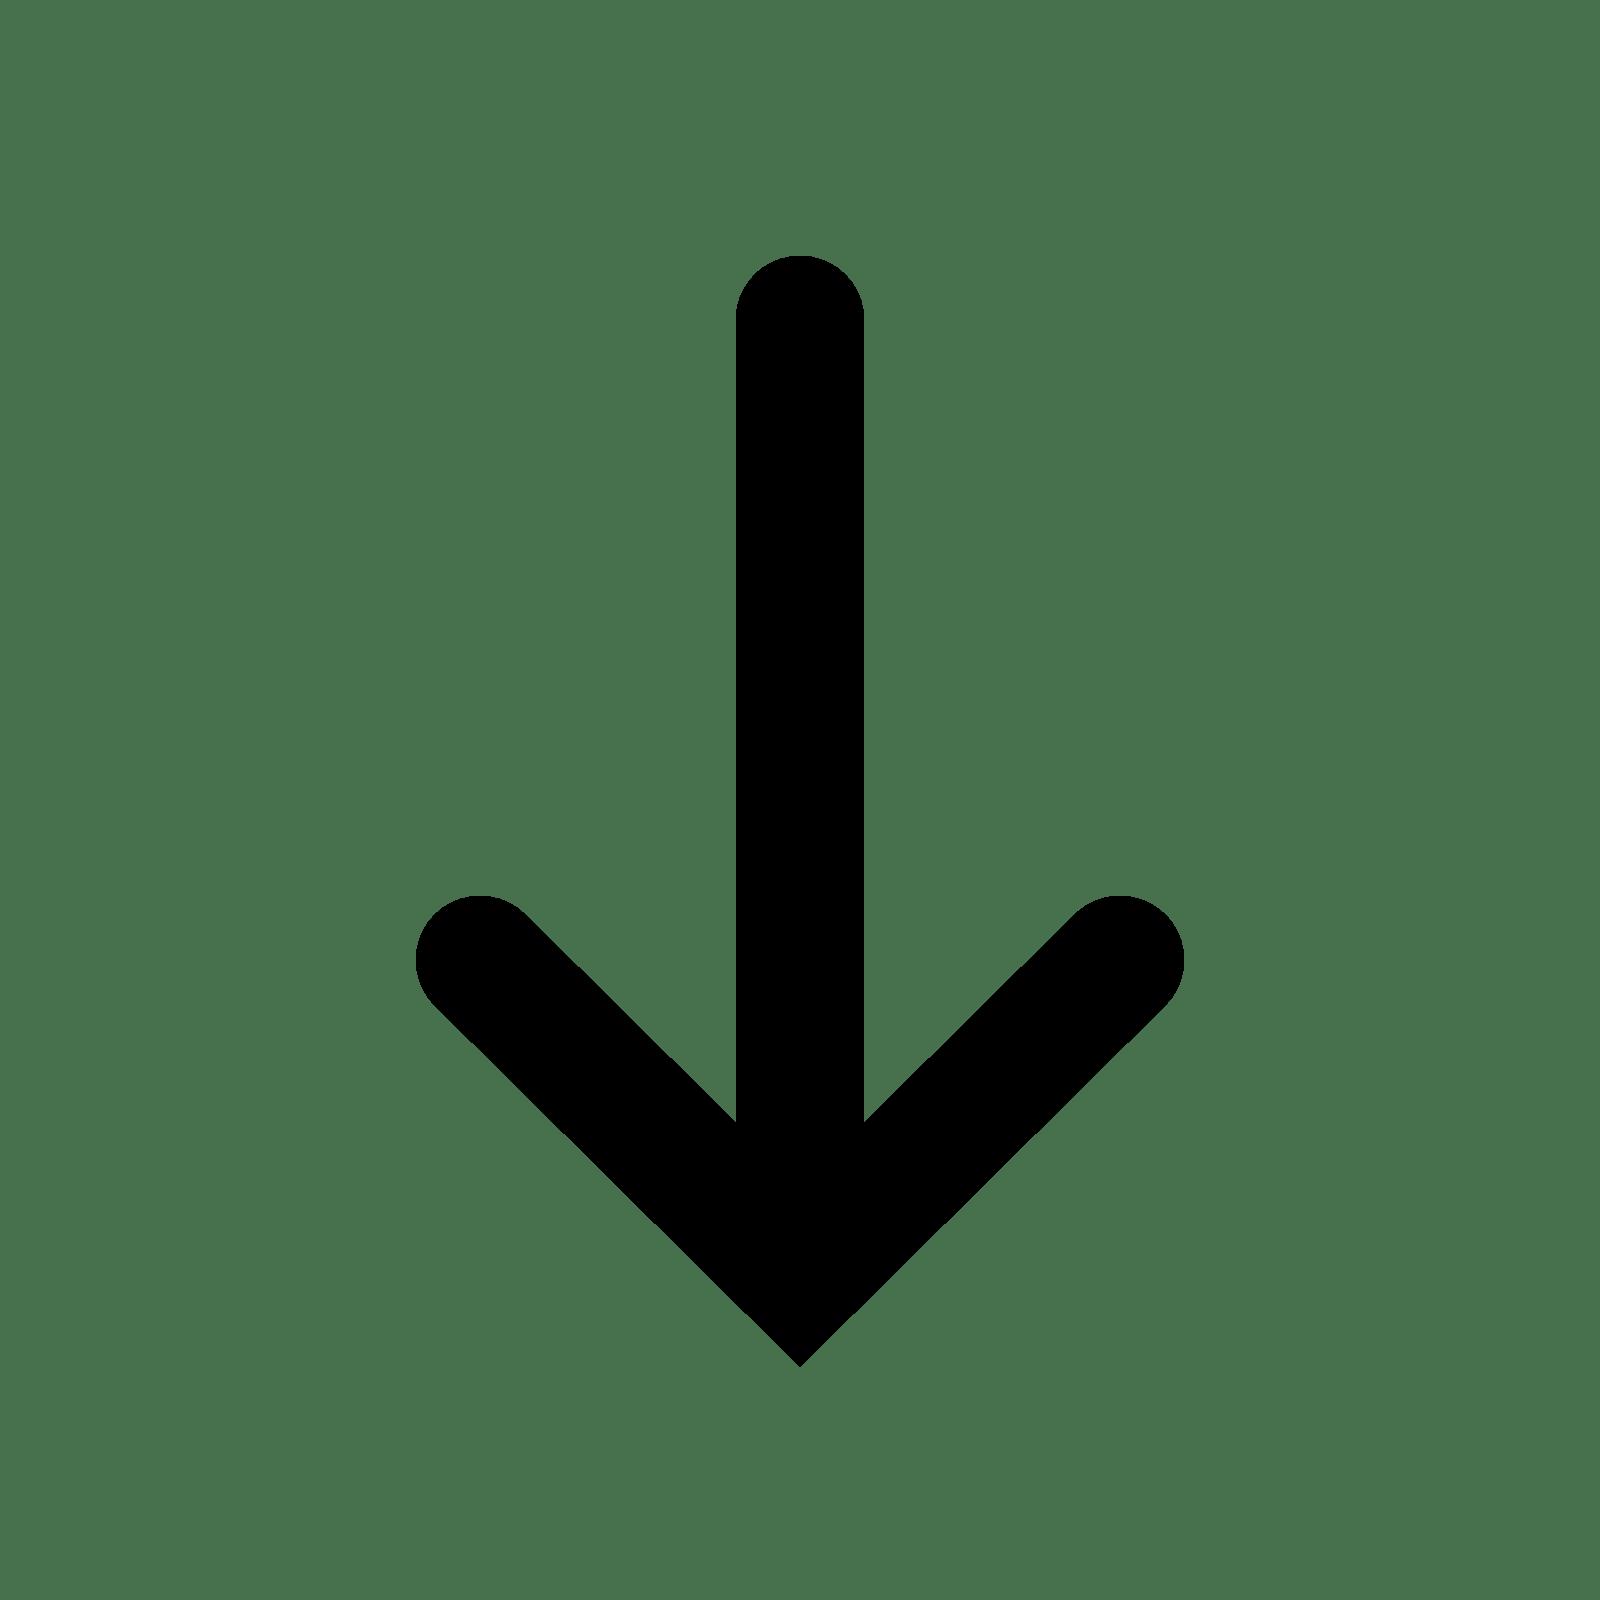 black arrow symbol